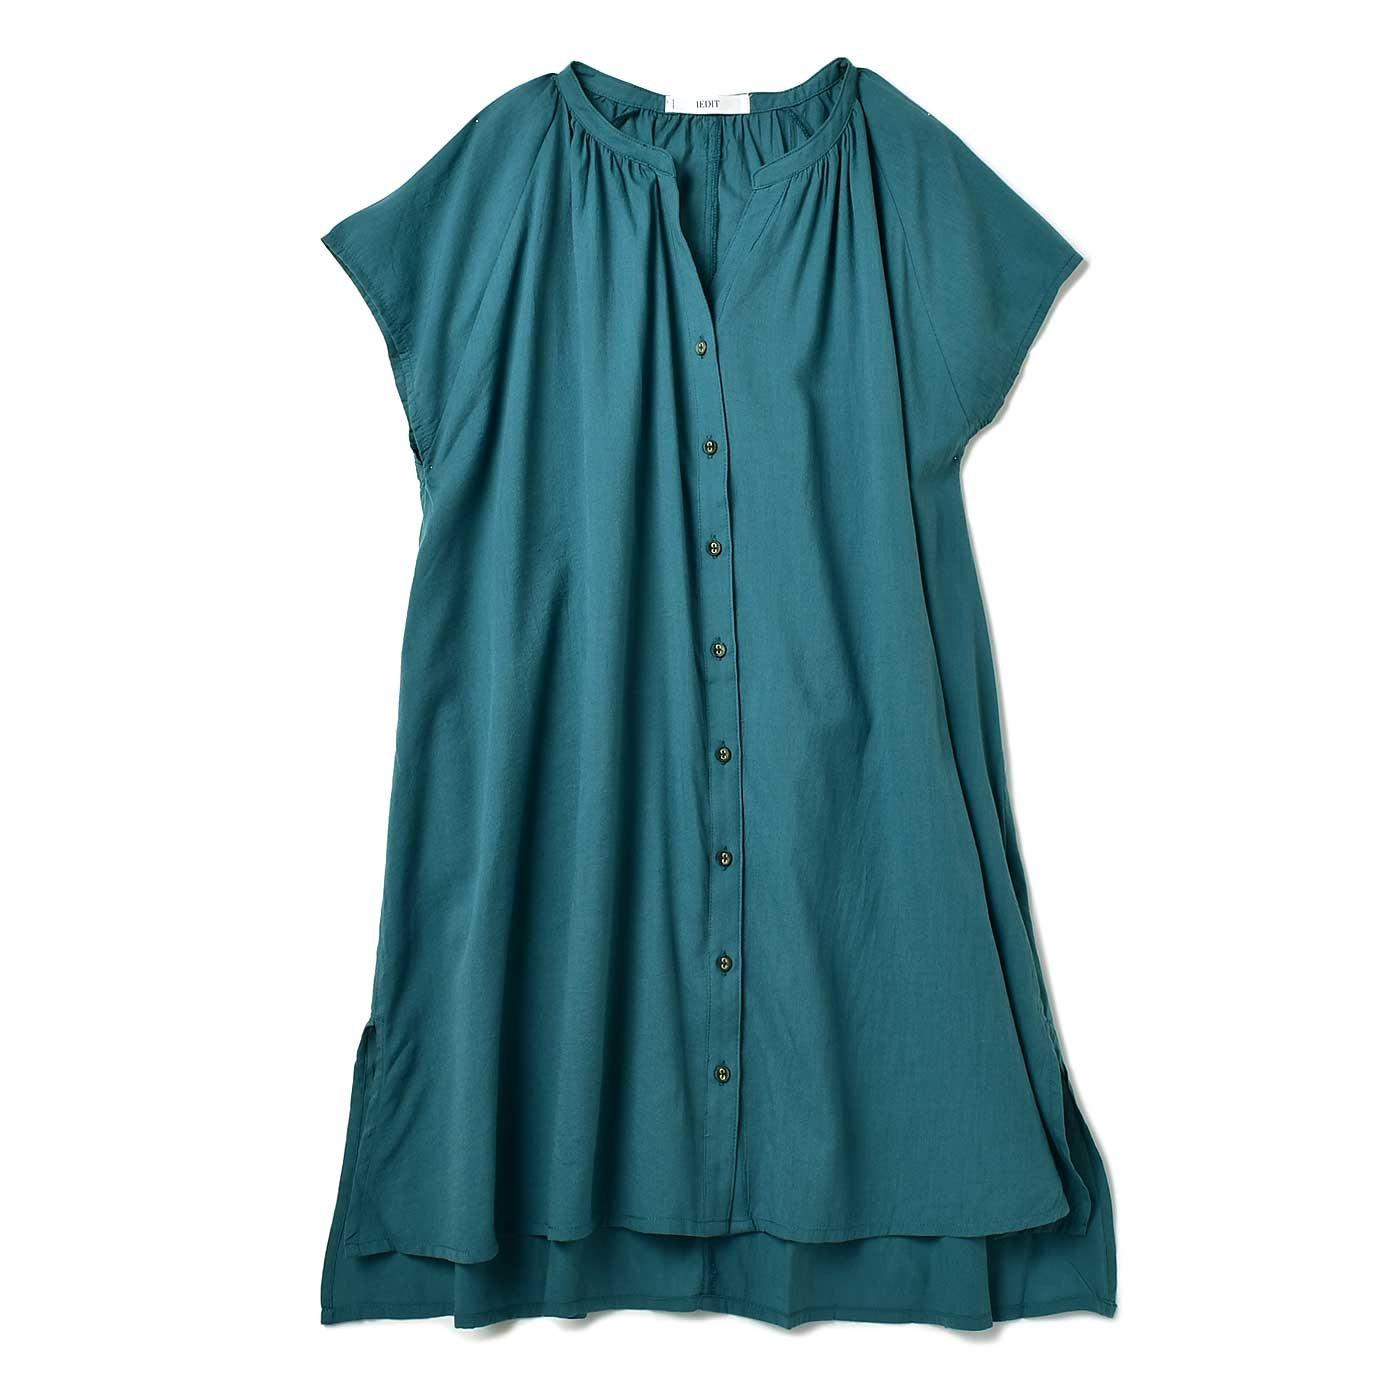 IEDIT[イディット] ギャザーシャツチュニック〈グリーン〉